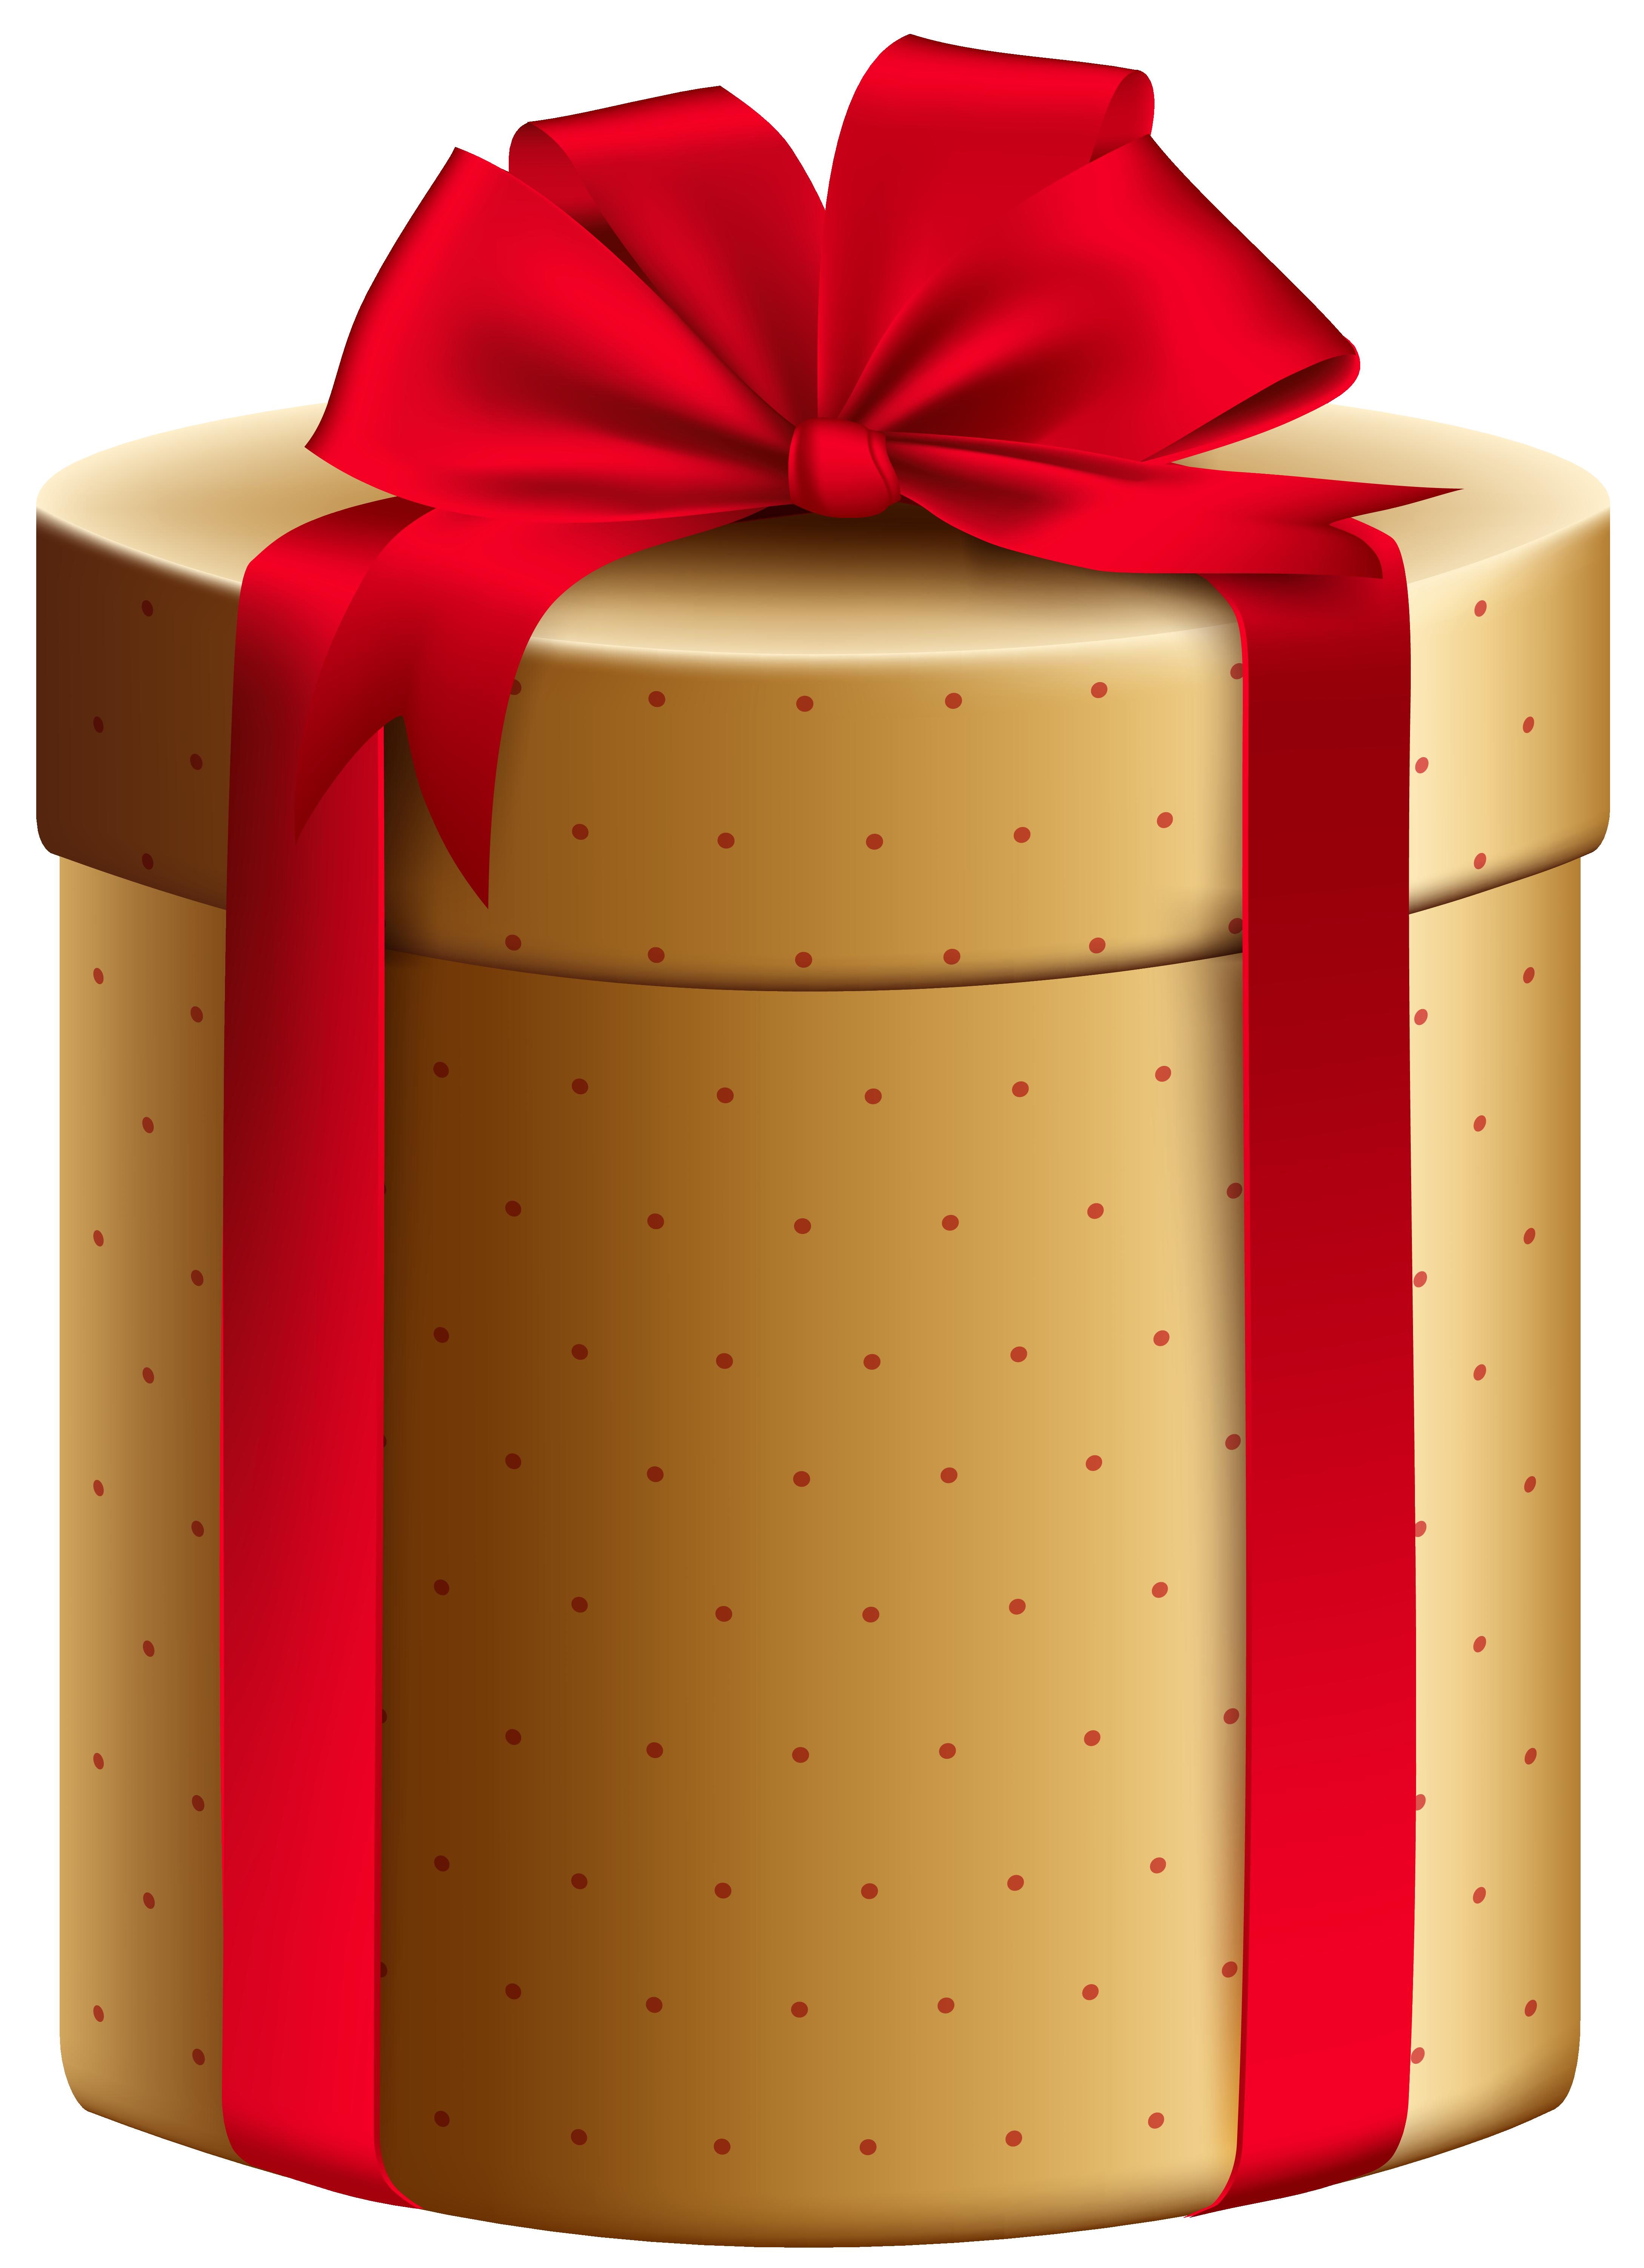 Gold red gift box. Clipart present orange